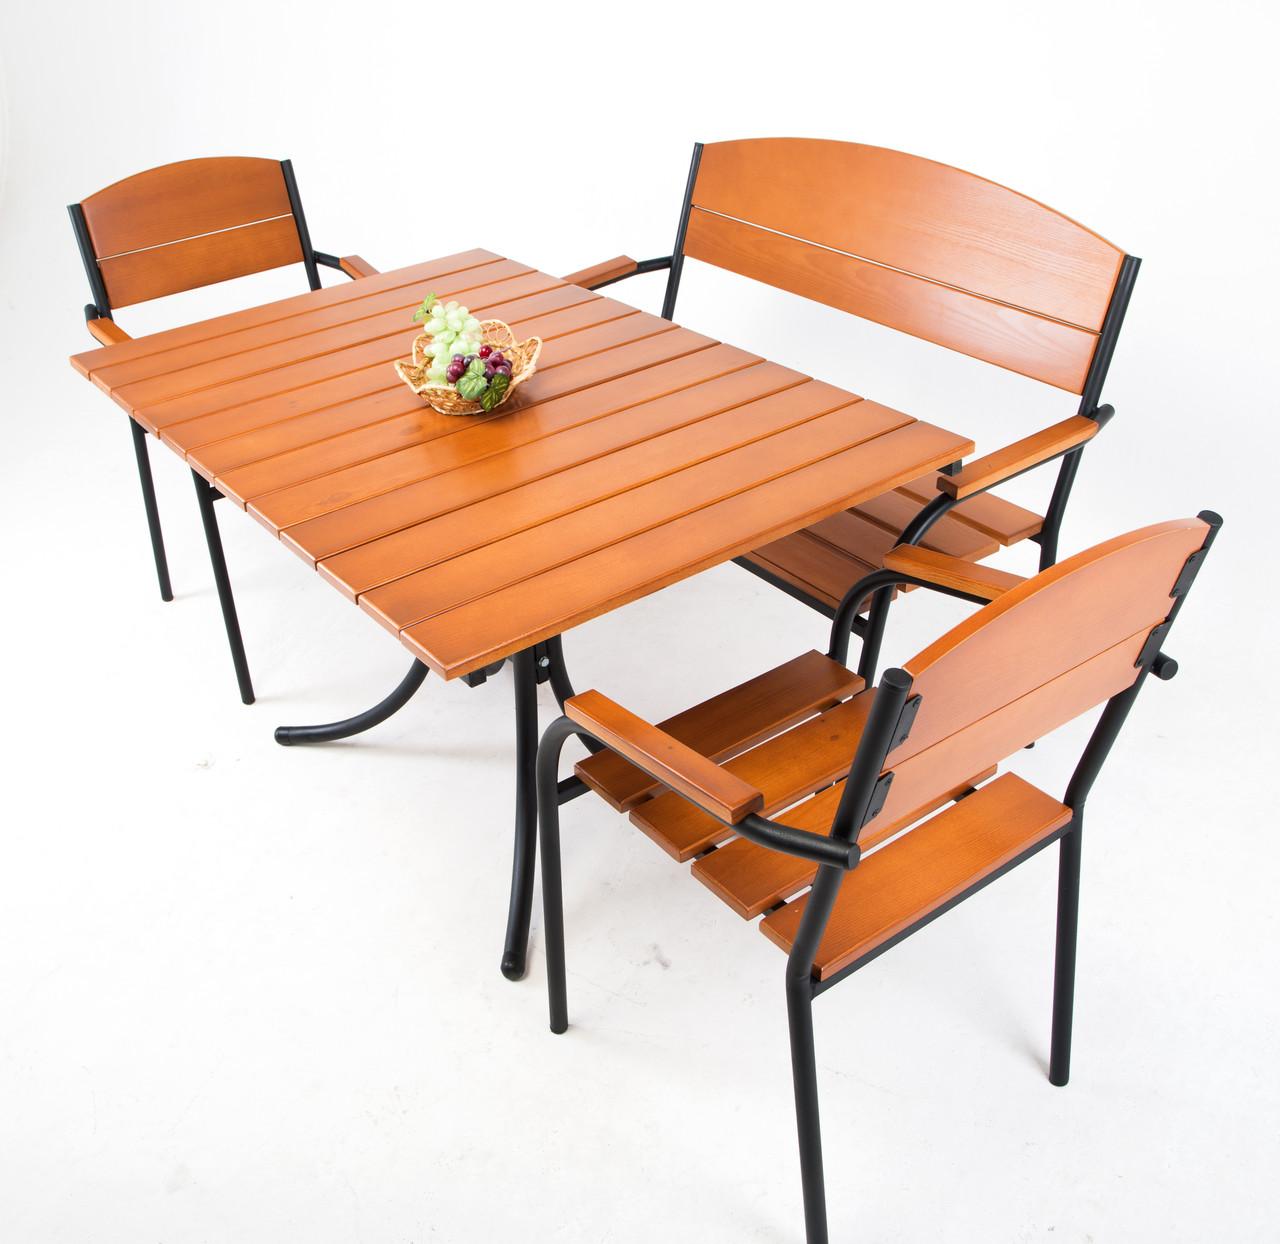 "Комплект мебели для кафе Микс-Лайн ""Фелиция"" Тик"